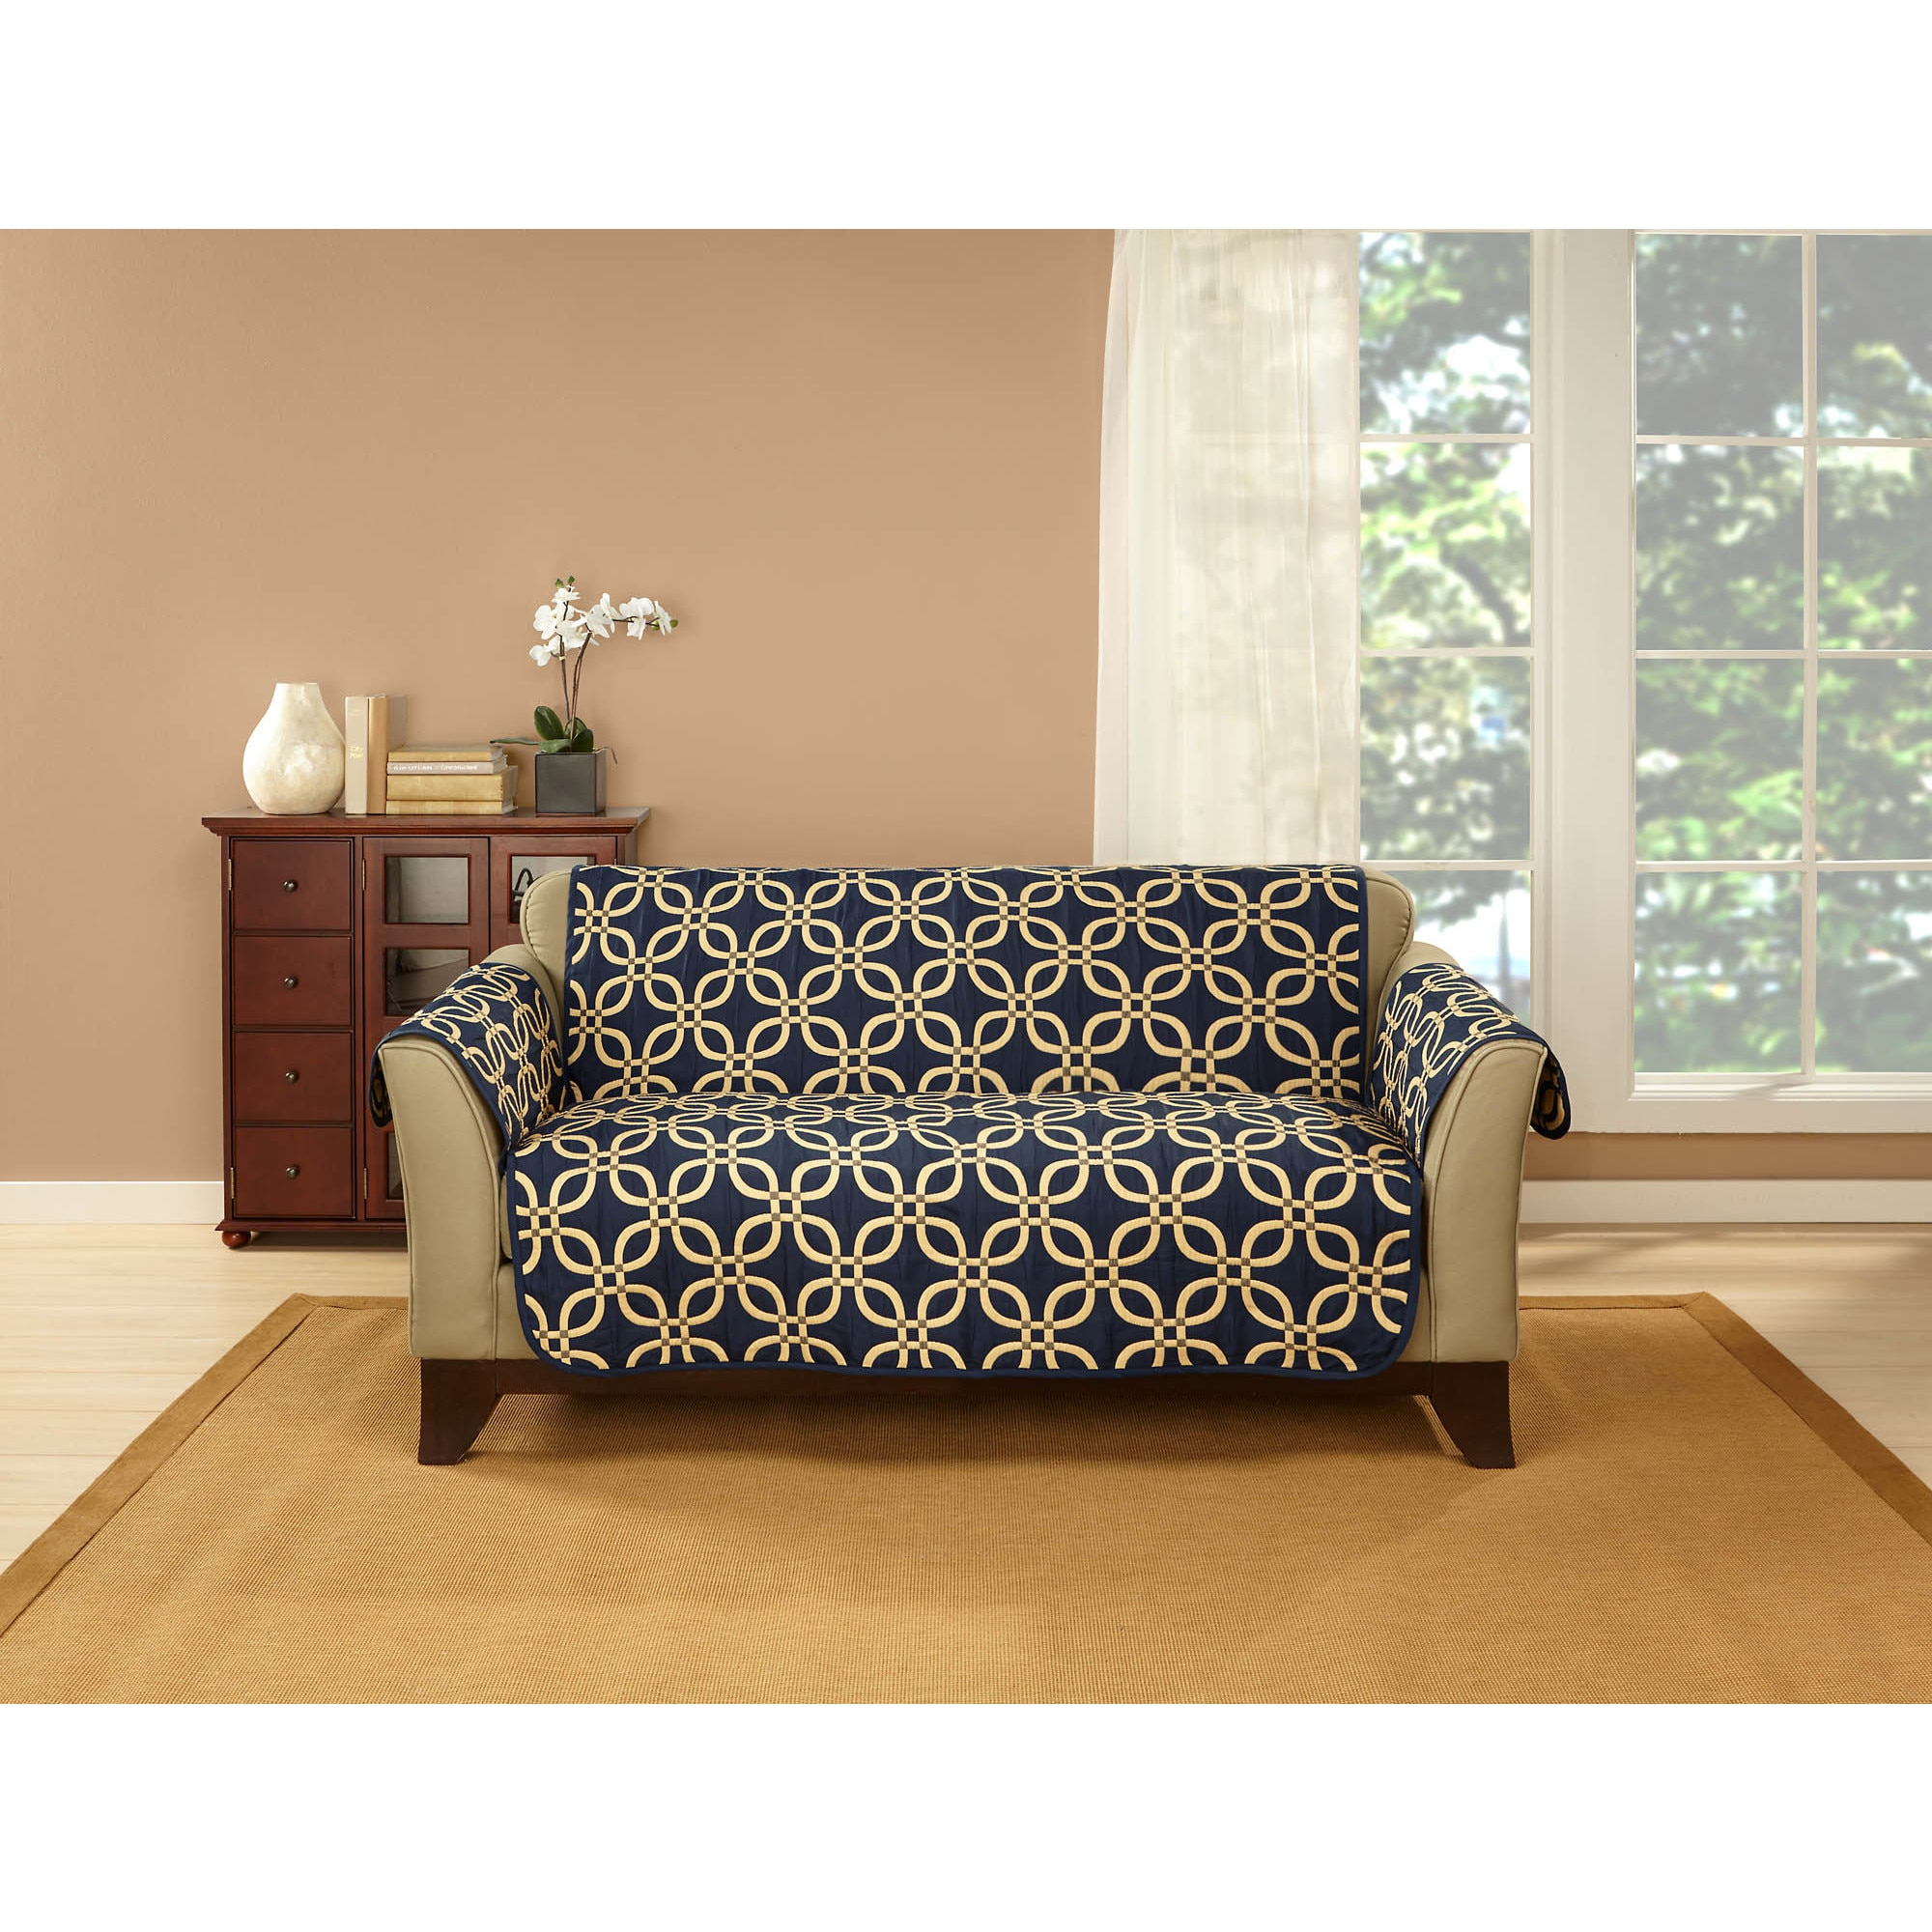 USA Belle Maison Memphis Reversible Sofa Protector (Midni...